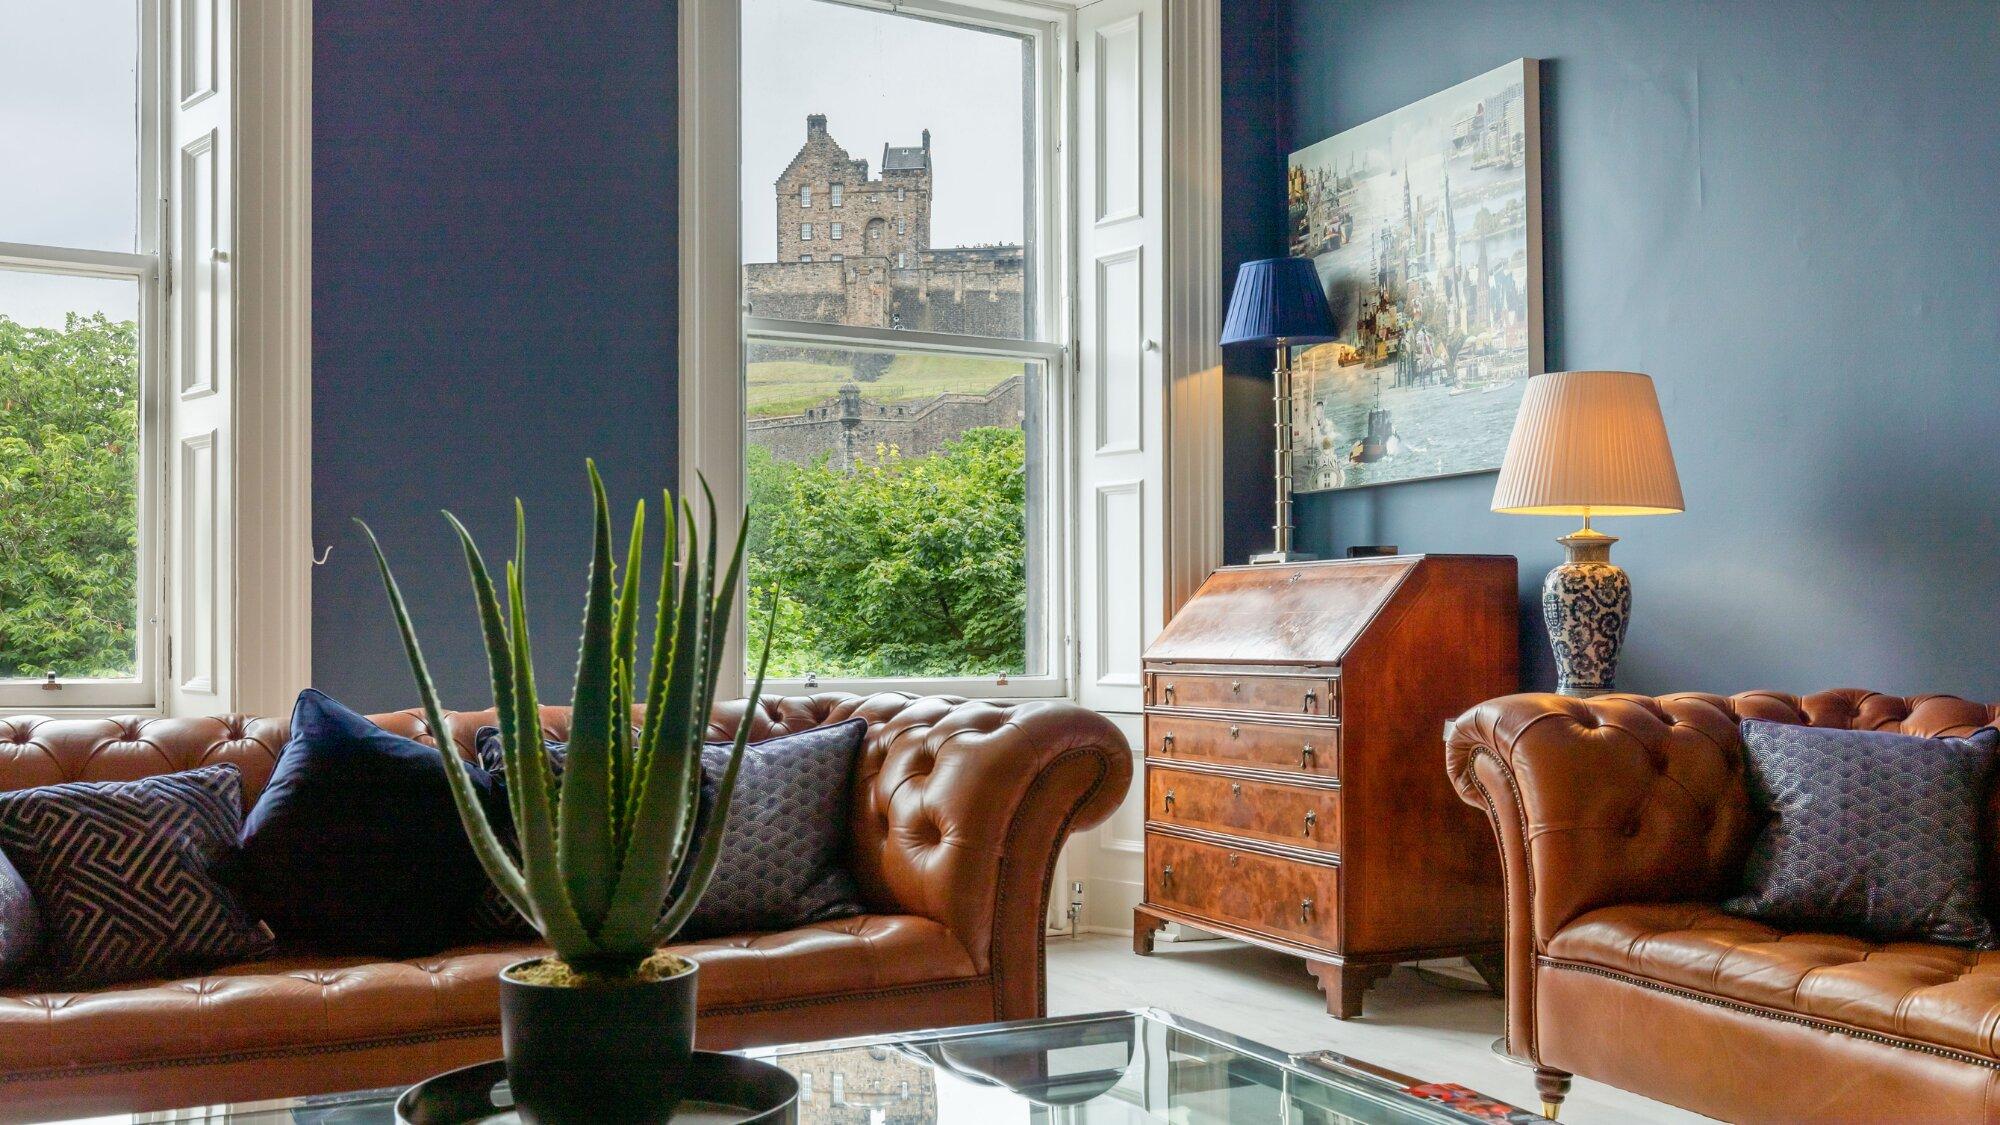 Edinburgh Accommodation Holiday let Scotland